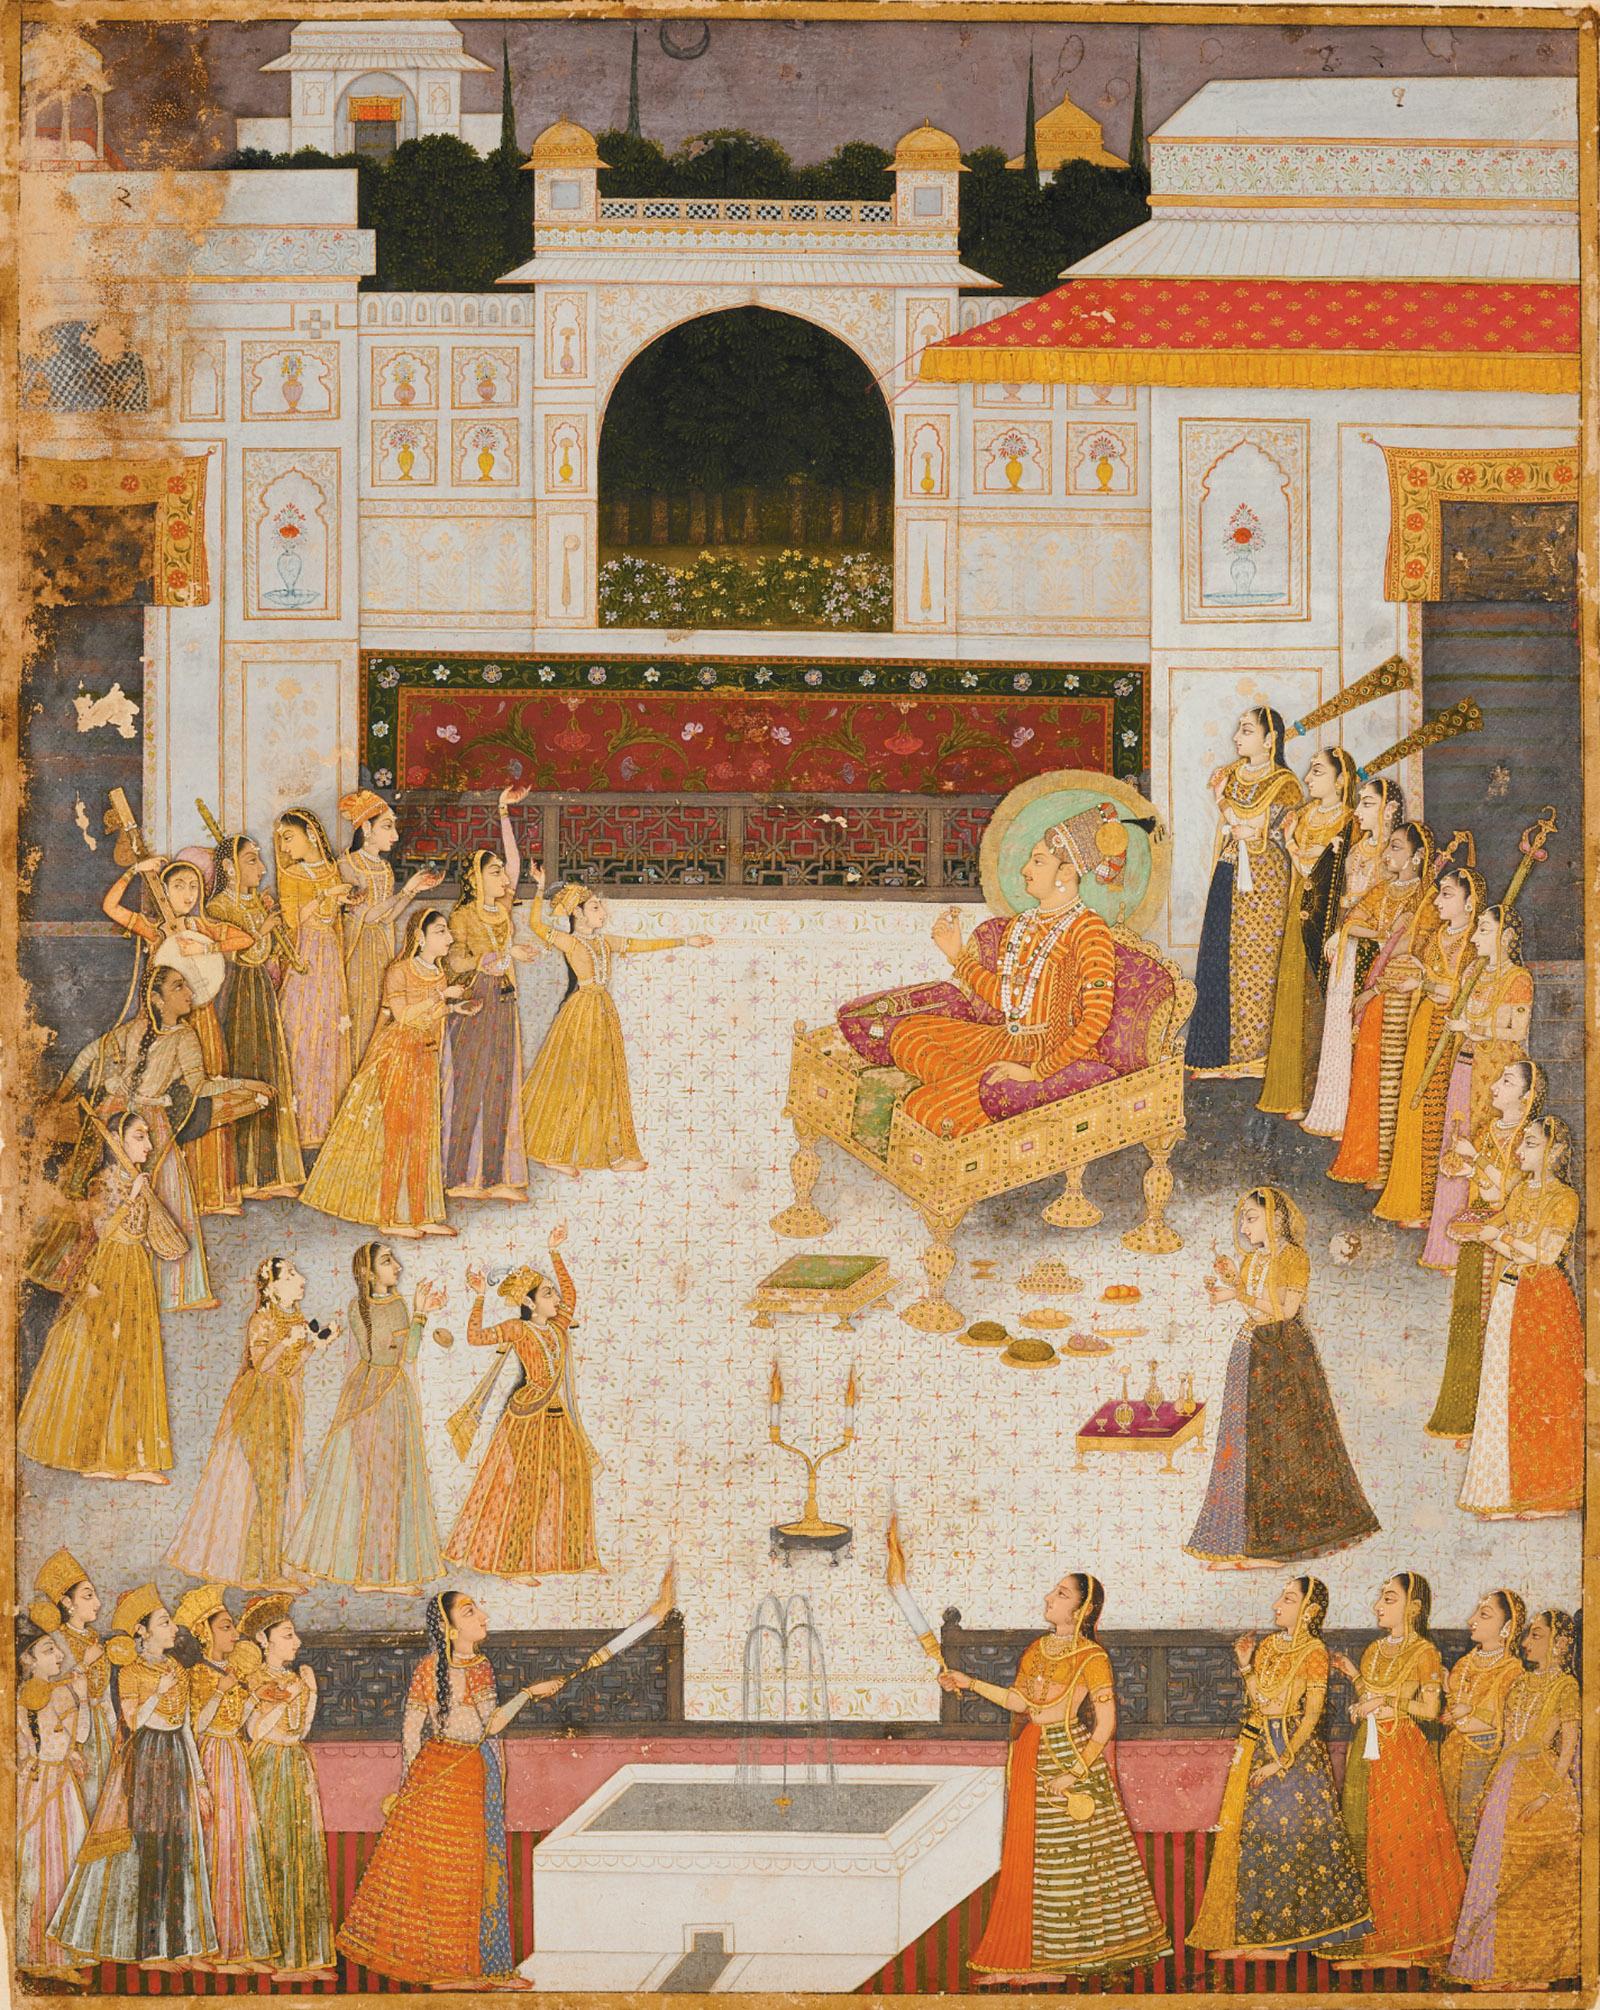 An Evening Performance for Maharaja Abhai Singh by Rai Dalchand